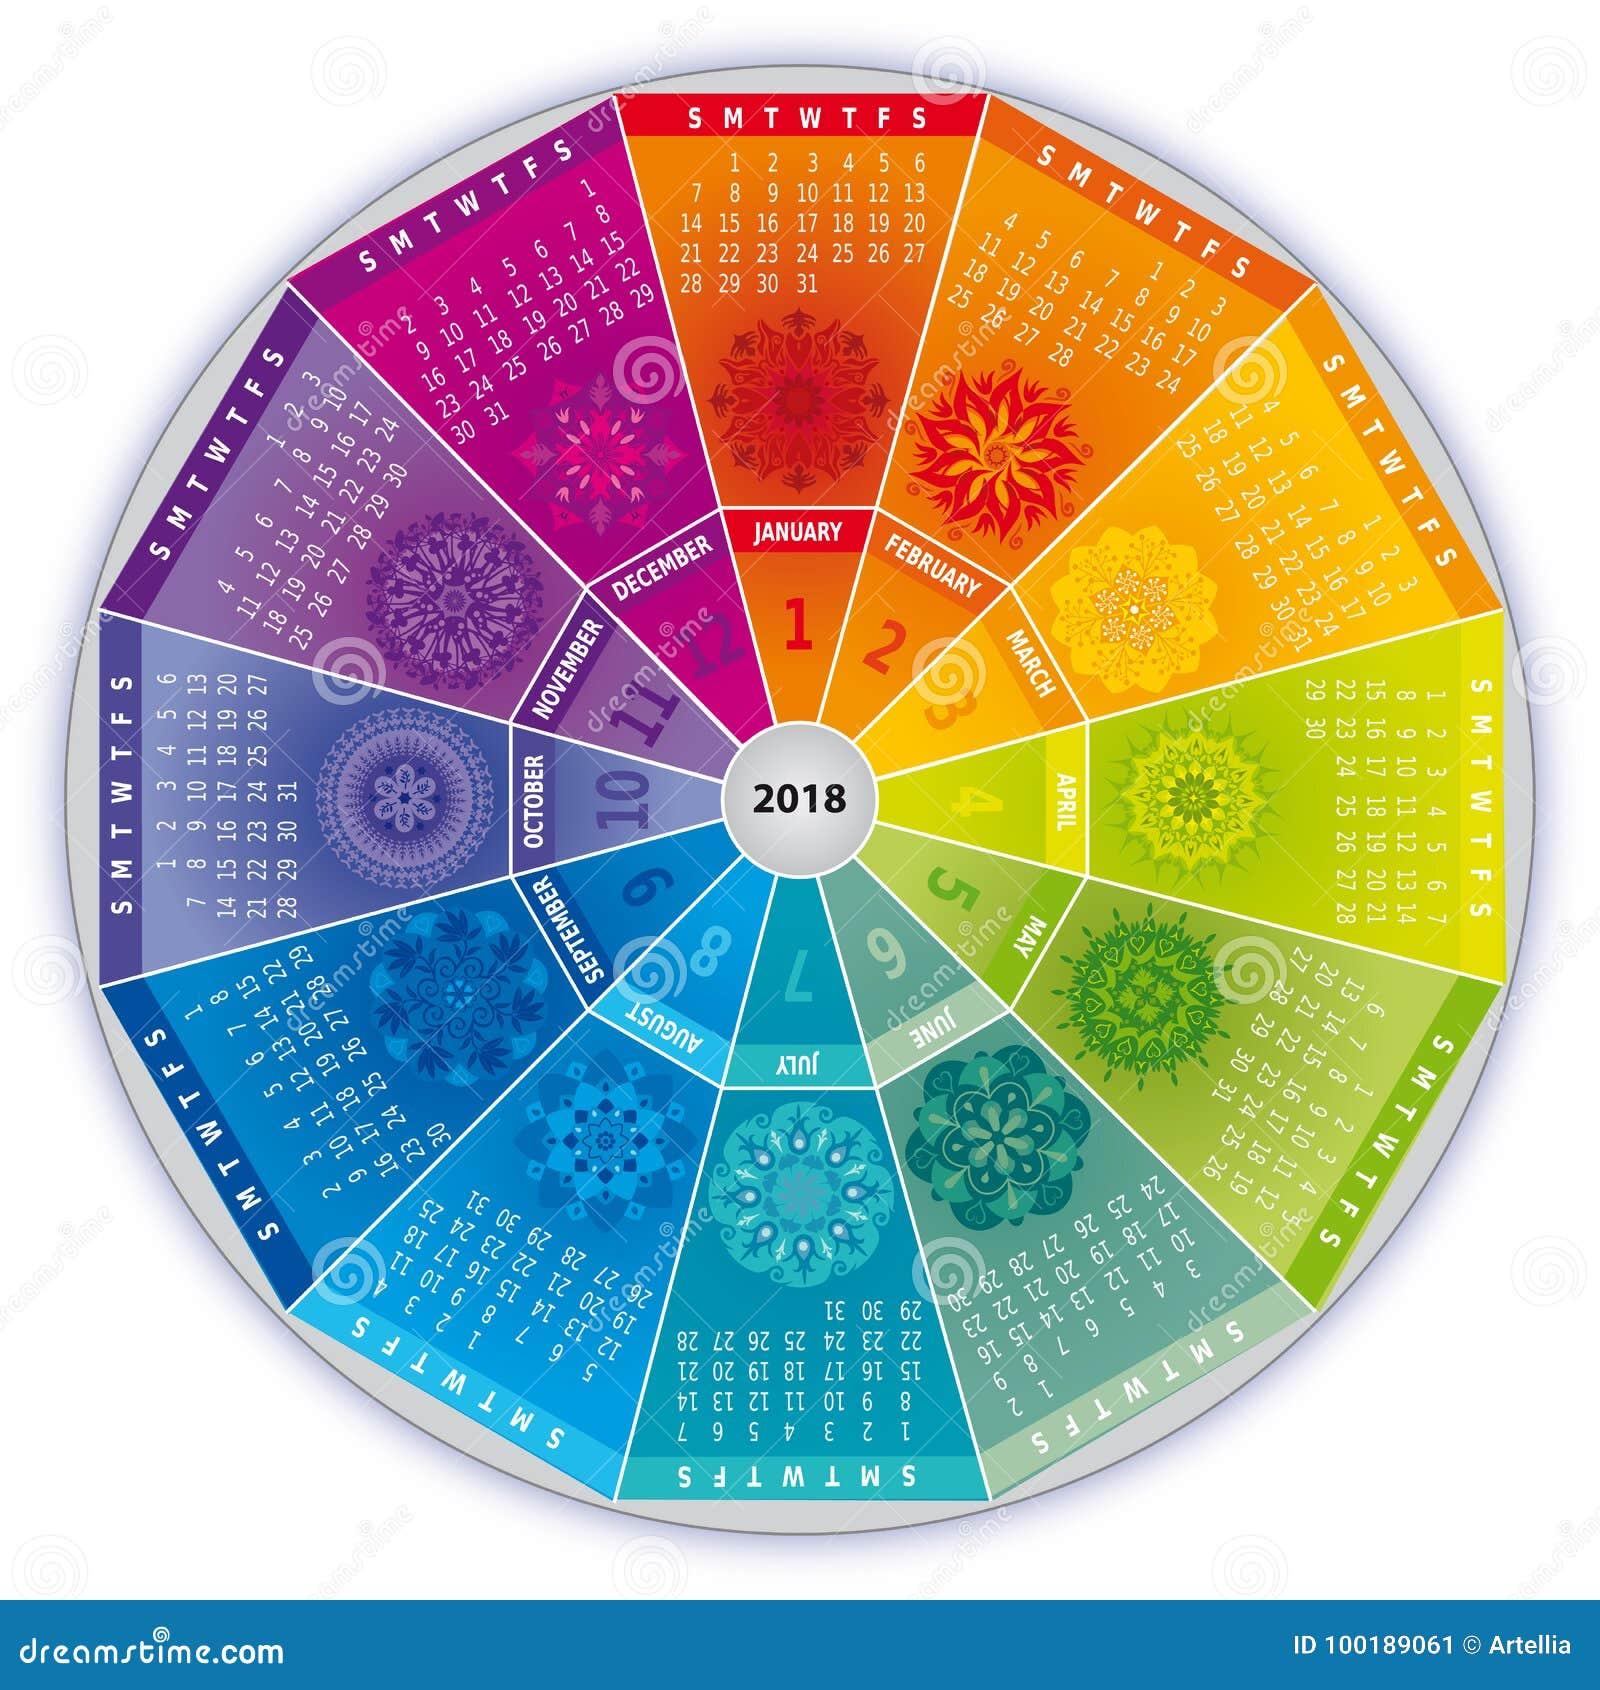 kalender 2018 mit mandalen in den regenbogen farben vektor abbildung illustration von karma. Black Bedroom Furniture Sets. Home Design Ideas